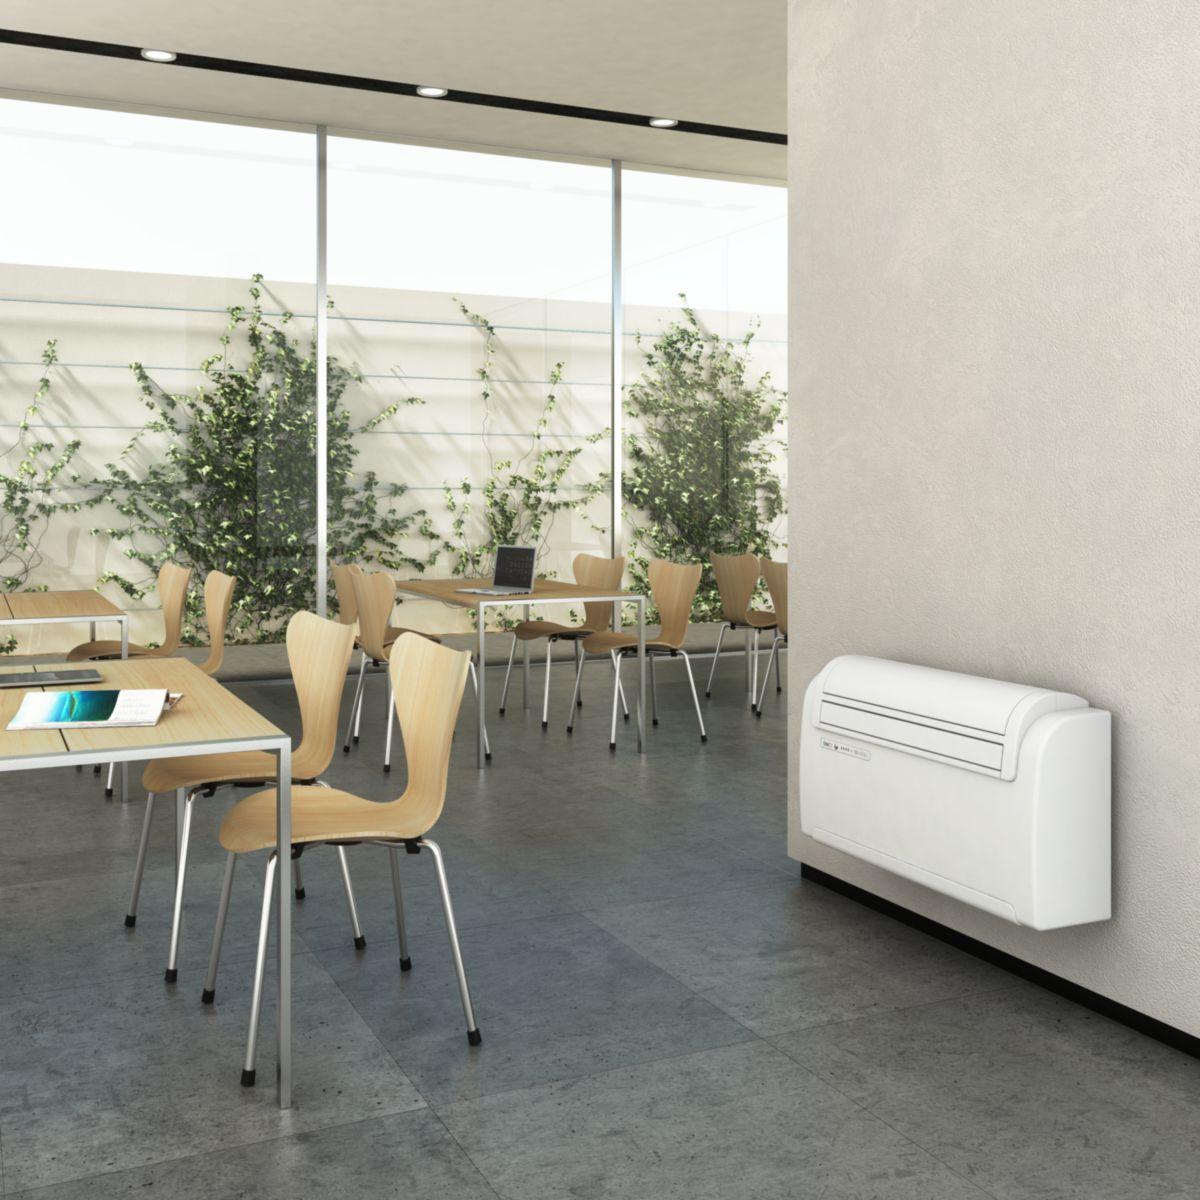 climatiseur monobloc unico inverter 12sp classe. Black Bedroom Furniture Sets. Home Design Ideas